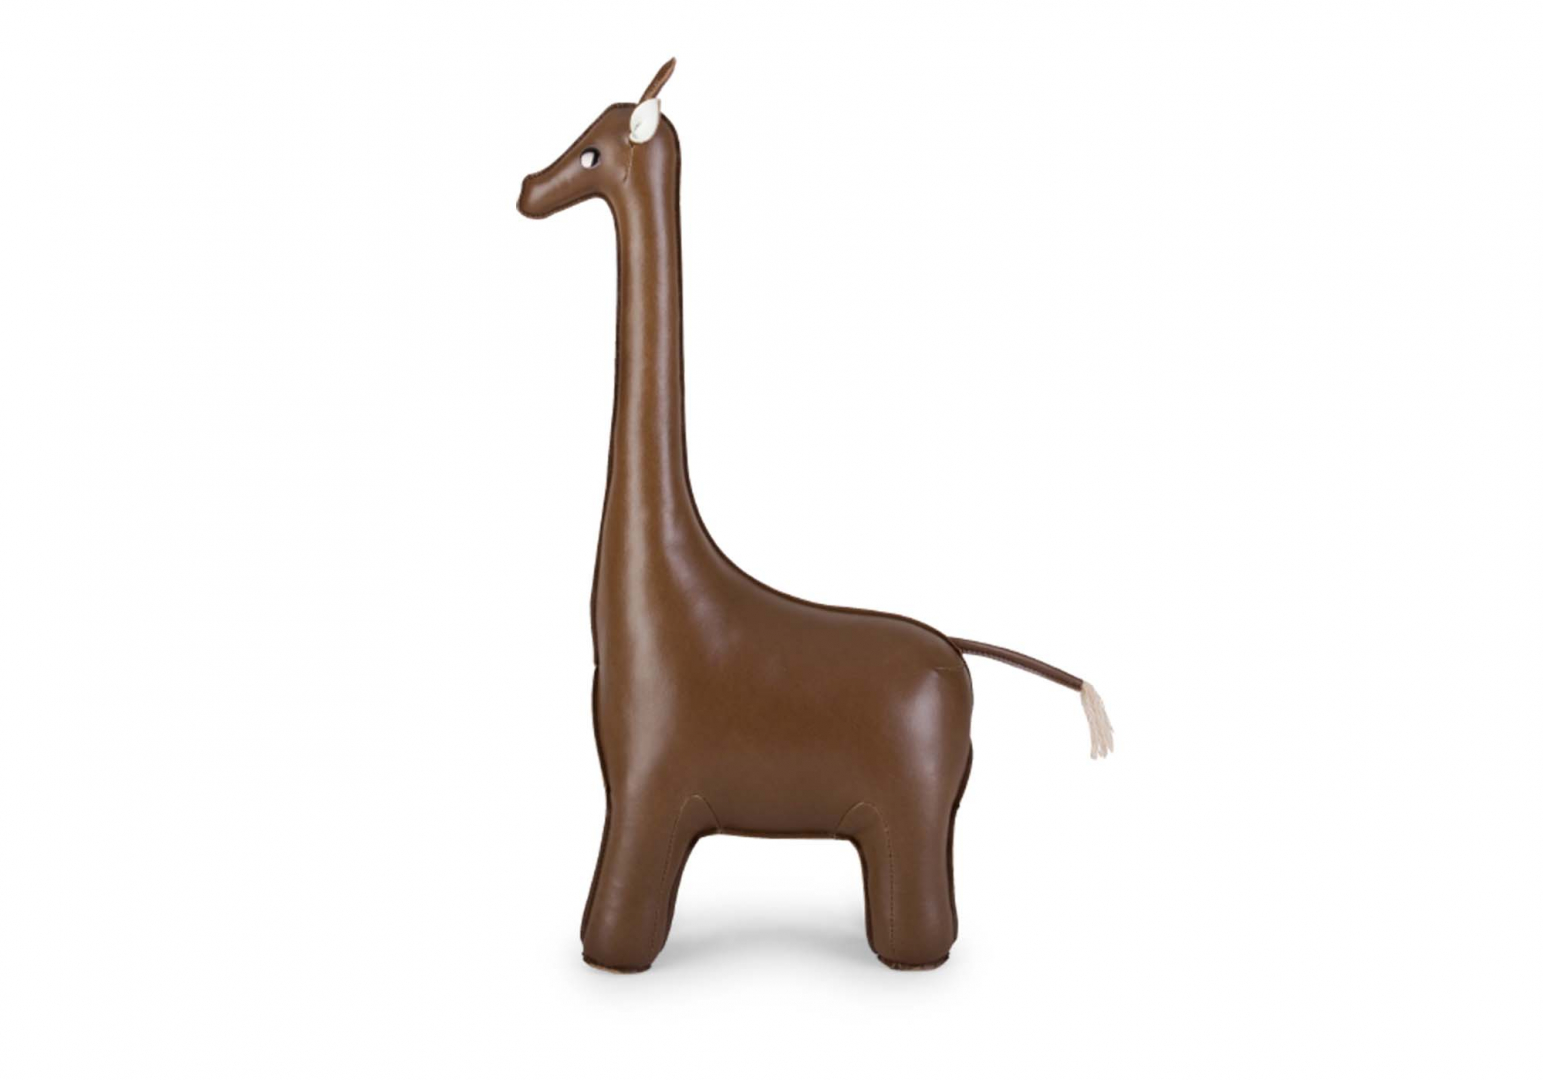 serre-livre design girafe zuny